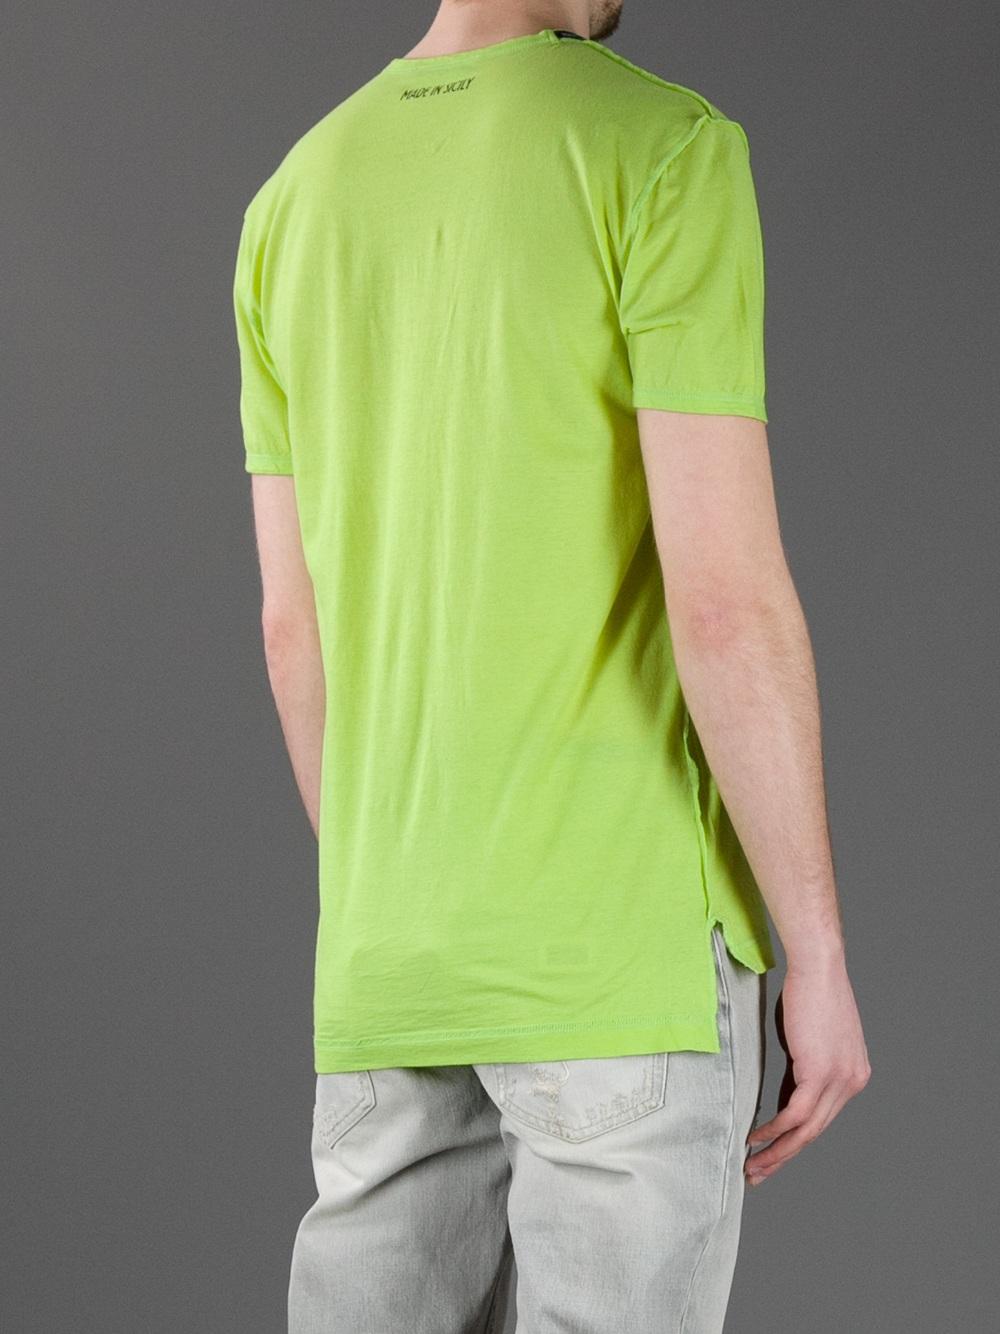 Dolce gabbana printed t shirt in green for men lyst for Dolce and gabbana printed t shirts